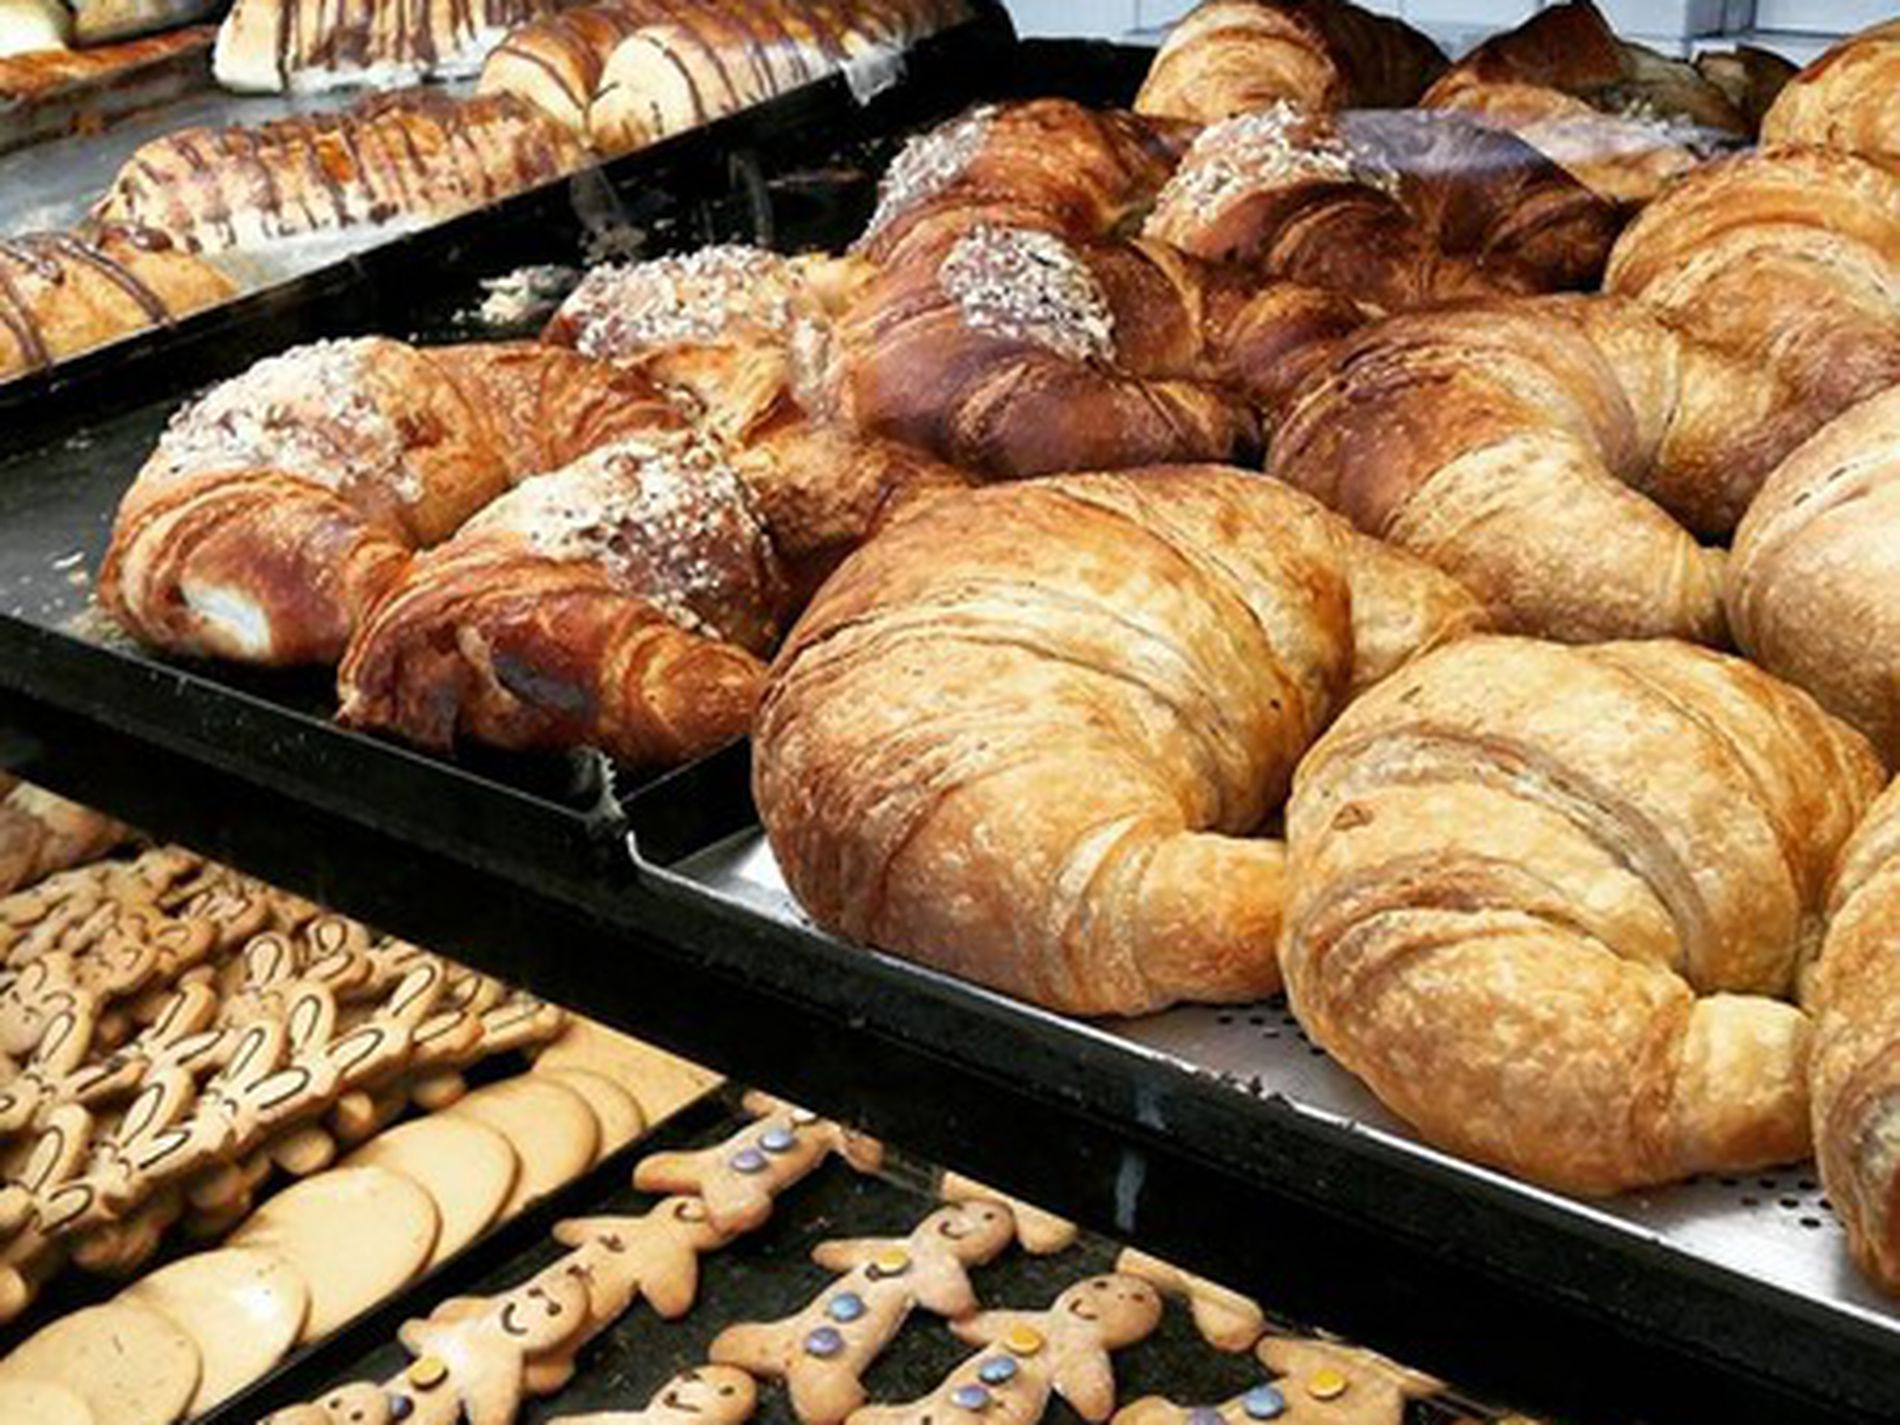 Bakery for sale - Mentone